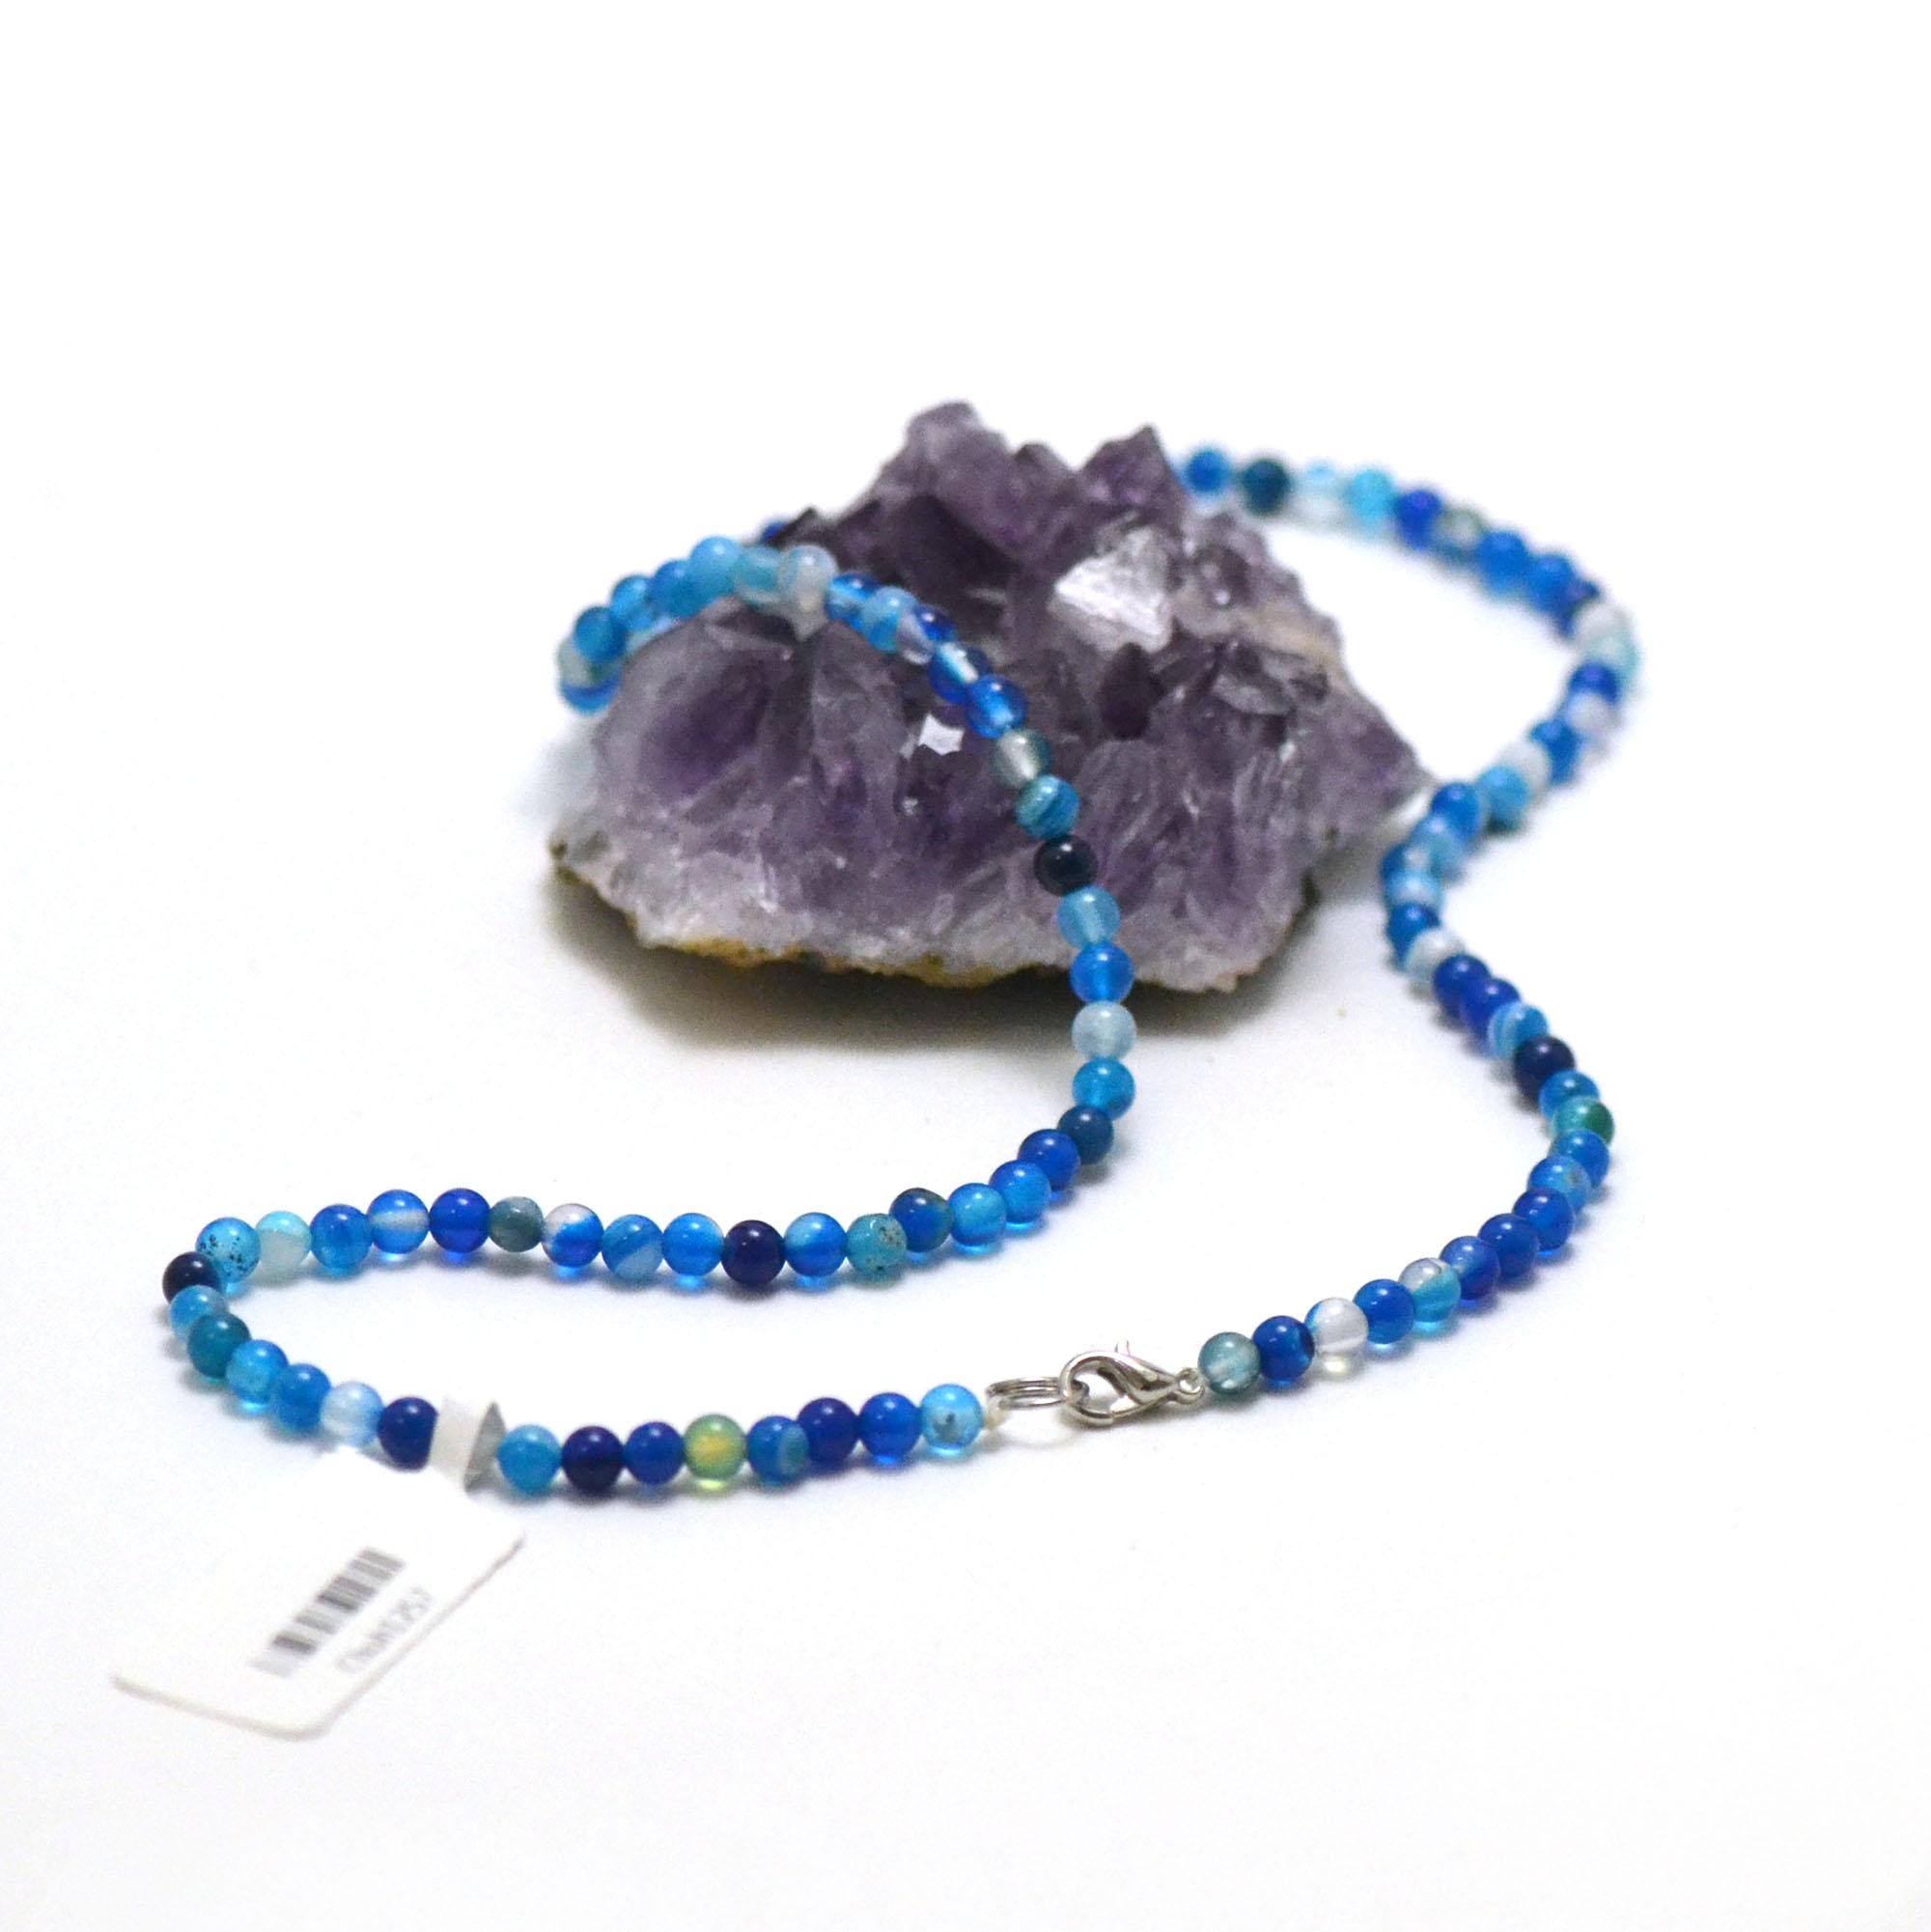 collier agate teinté bleu ronde 4 mm